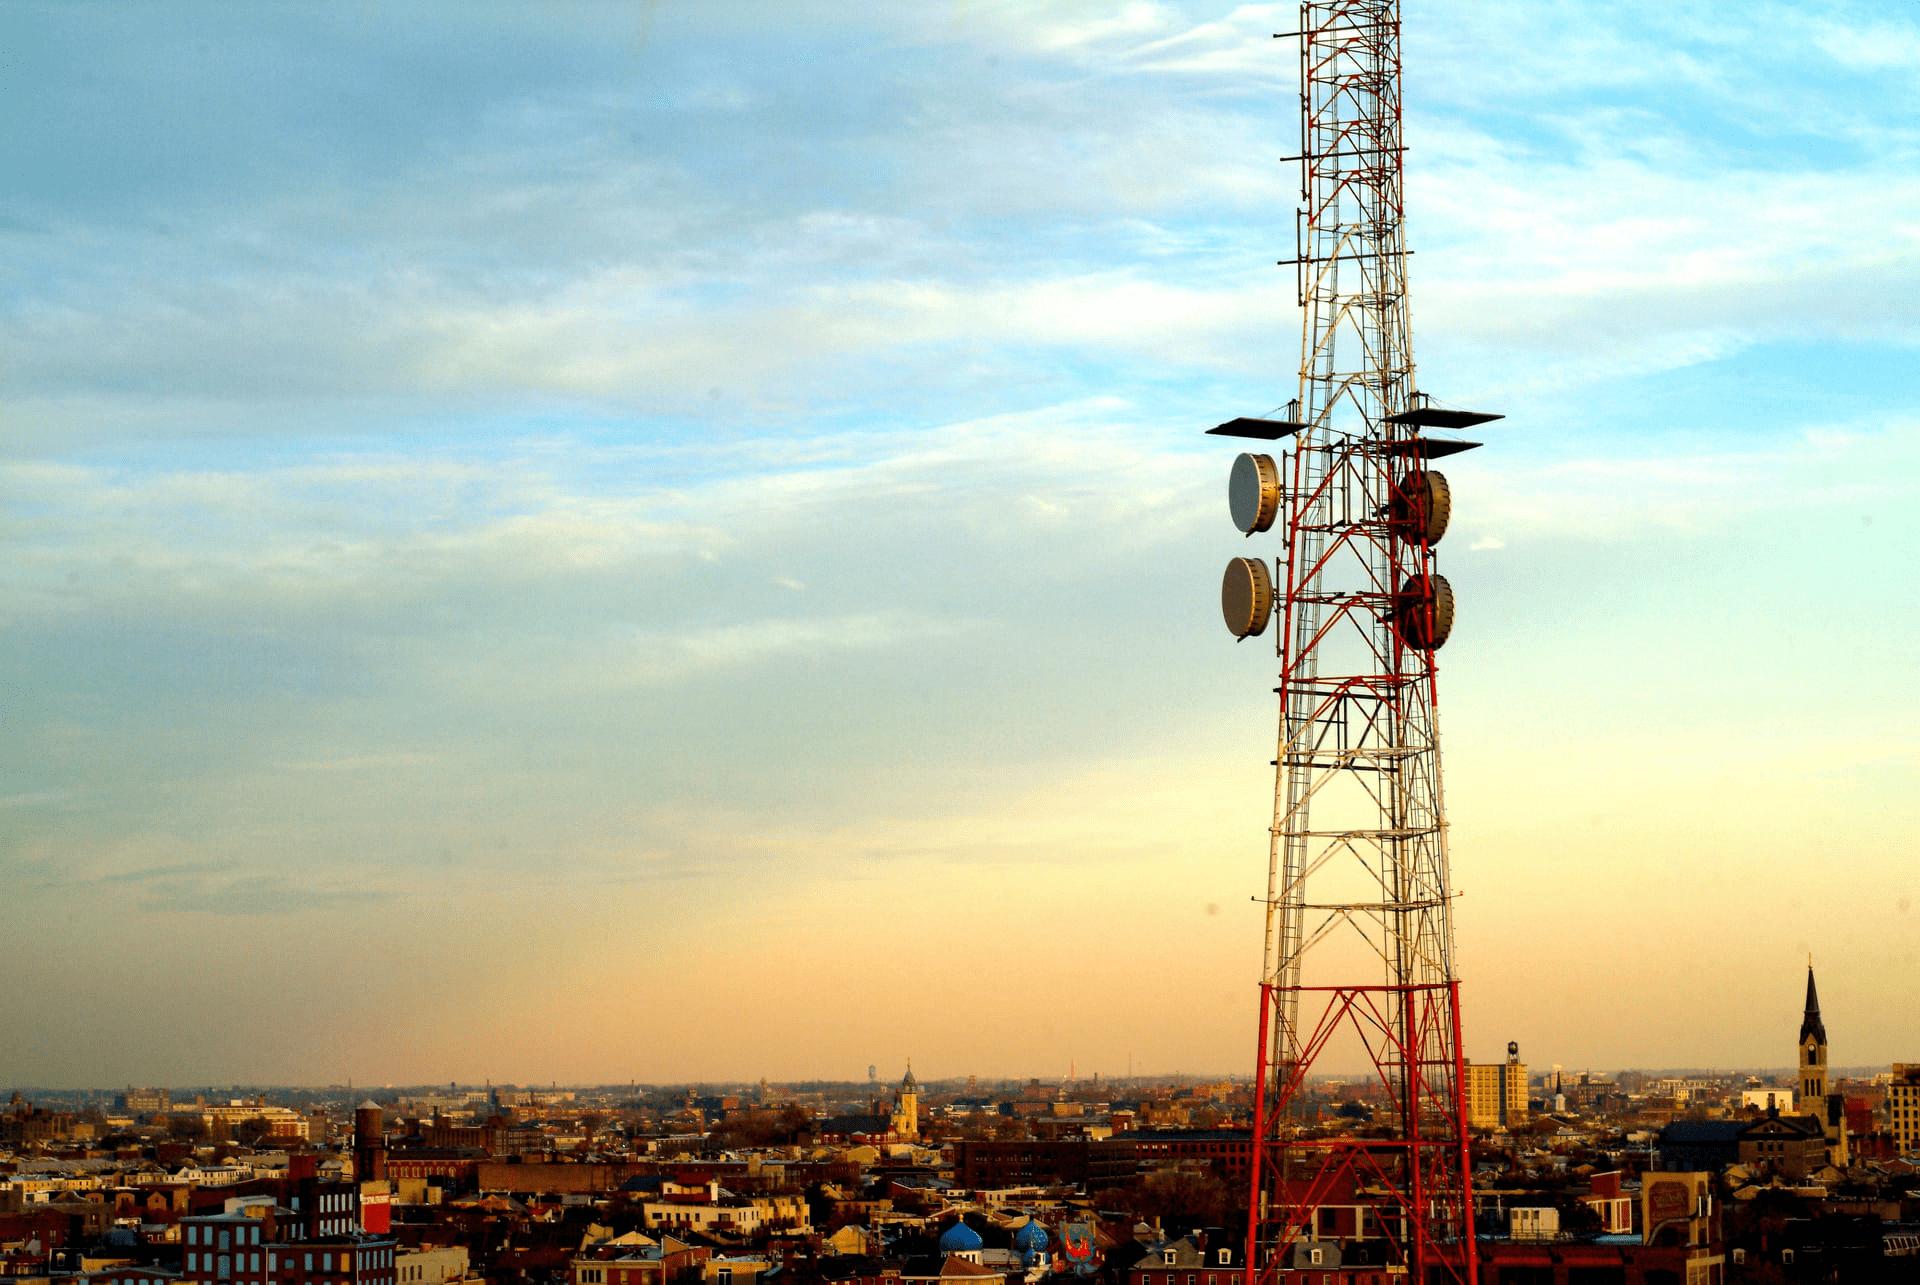 Harmoni Towers